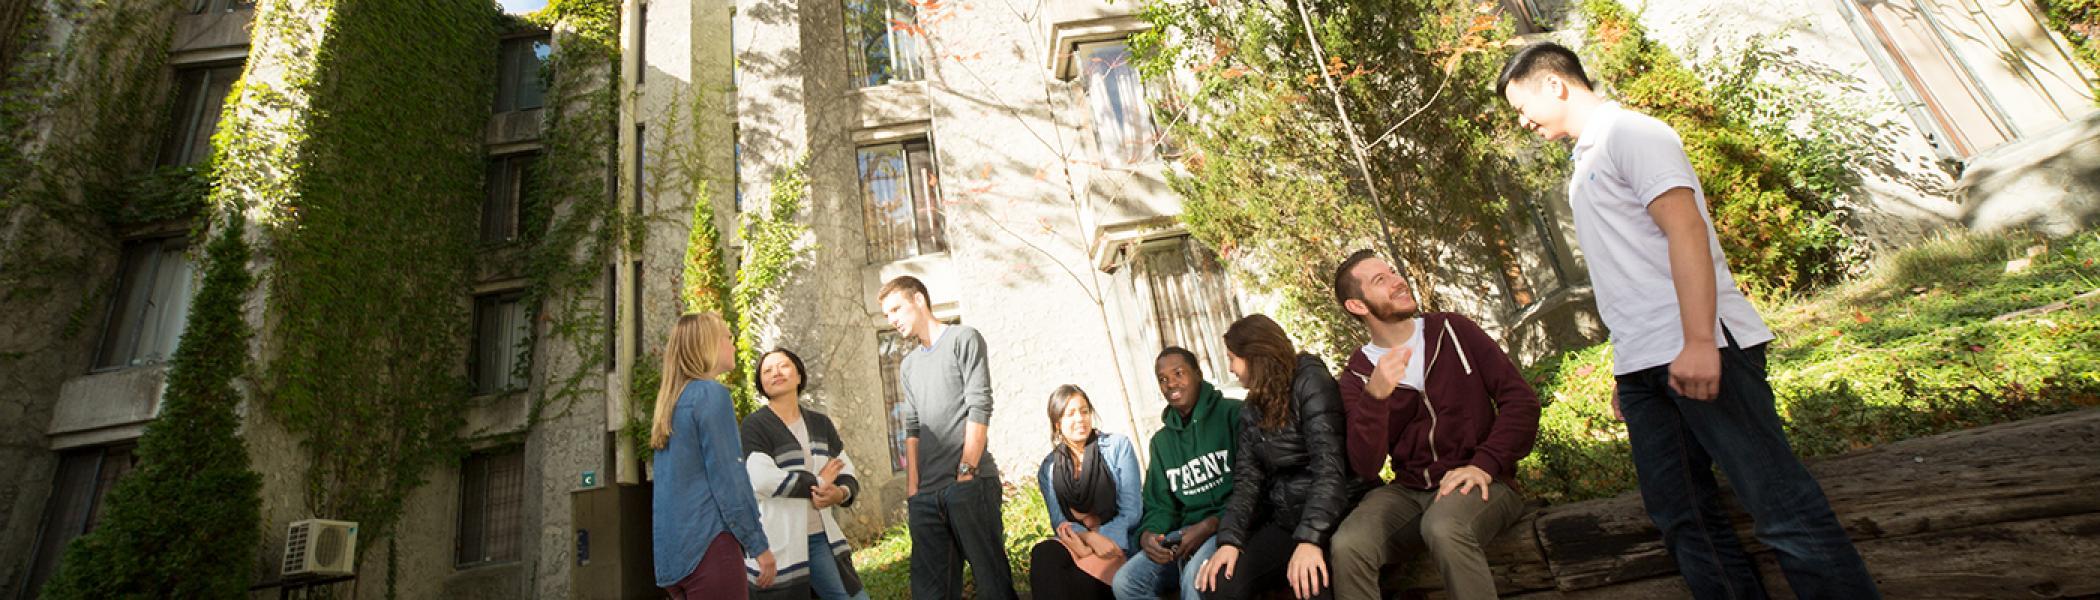 Students chatting outside Champlain quad